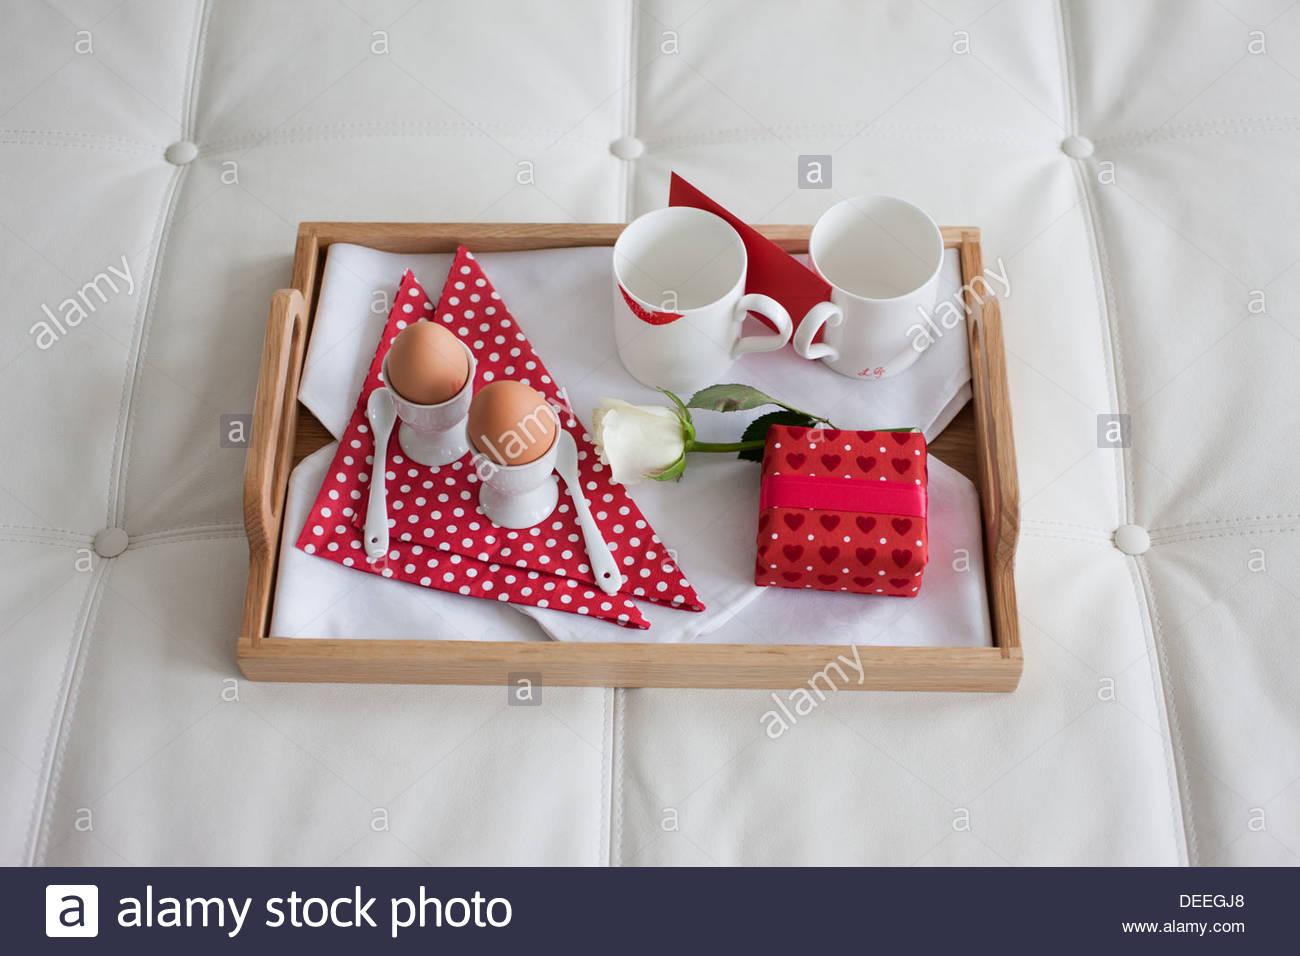 Valentine's Day breakfast tray Photo Stock